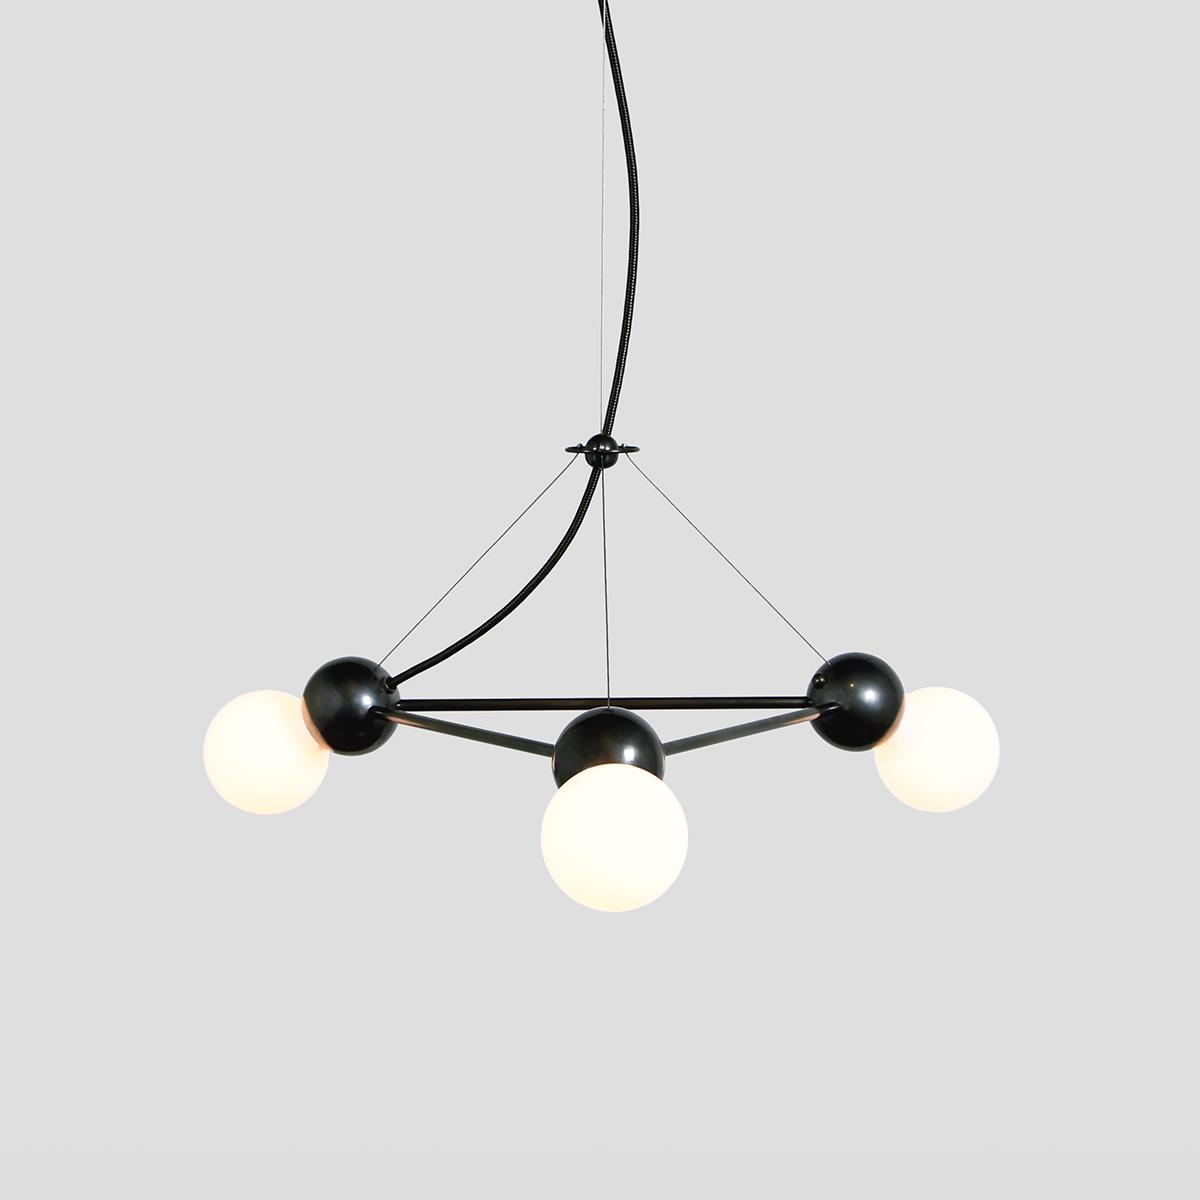 LINA 03-LIGHT TRIANGLE PENDANT